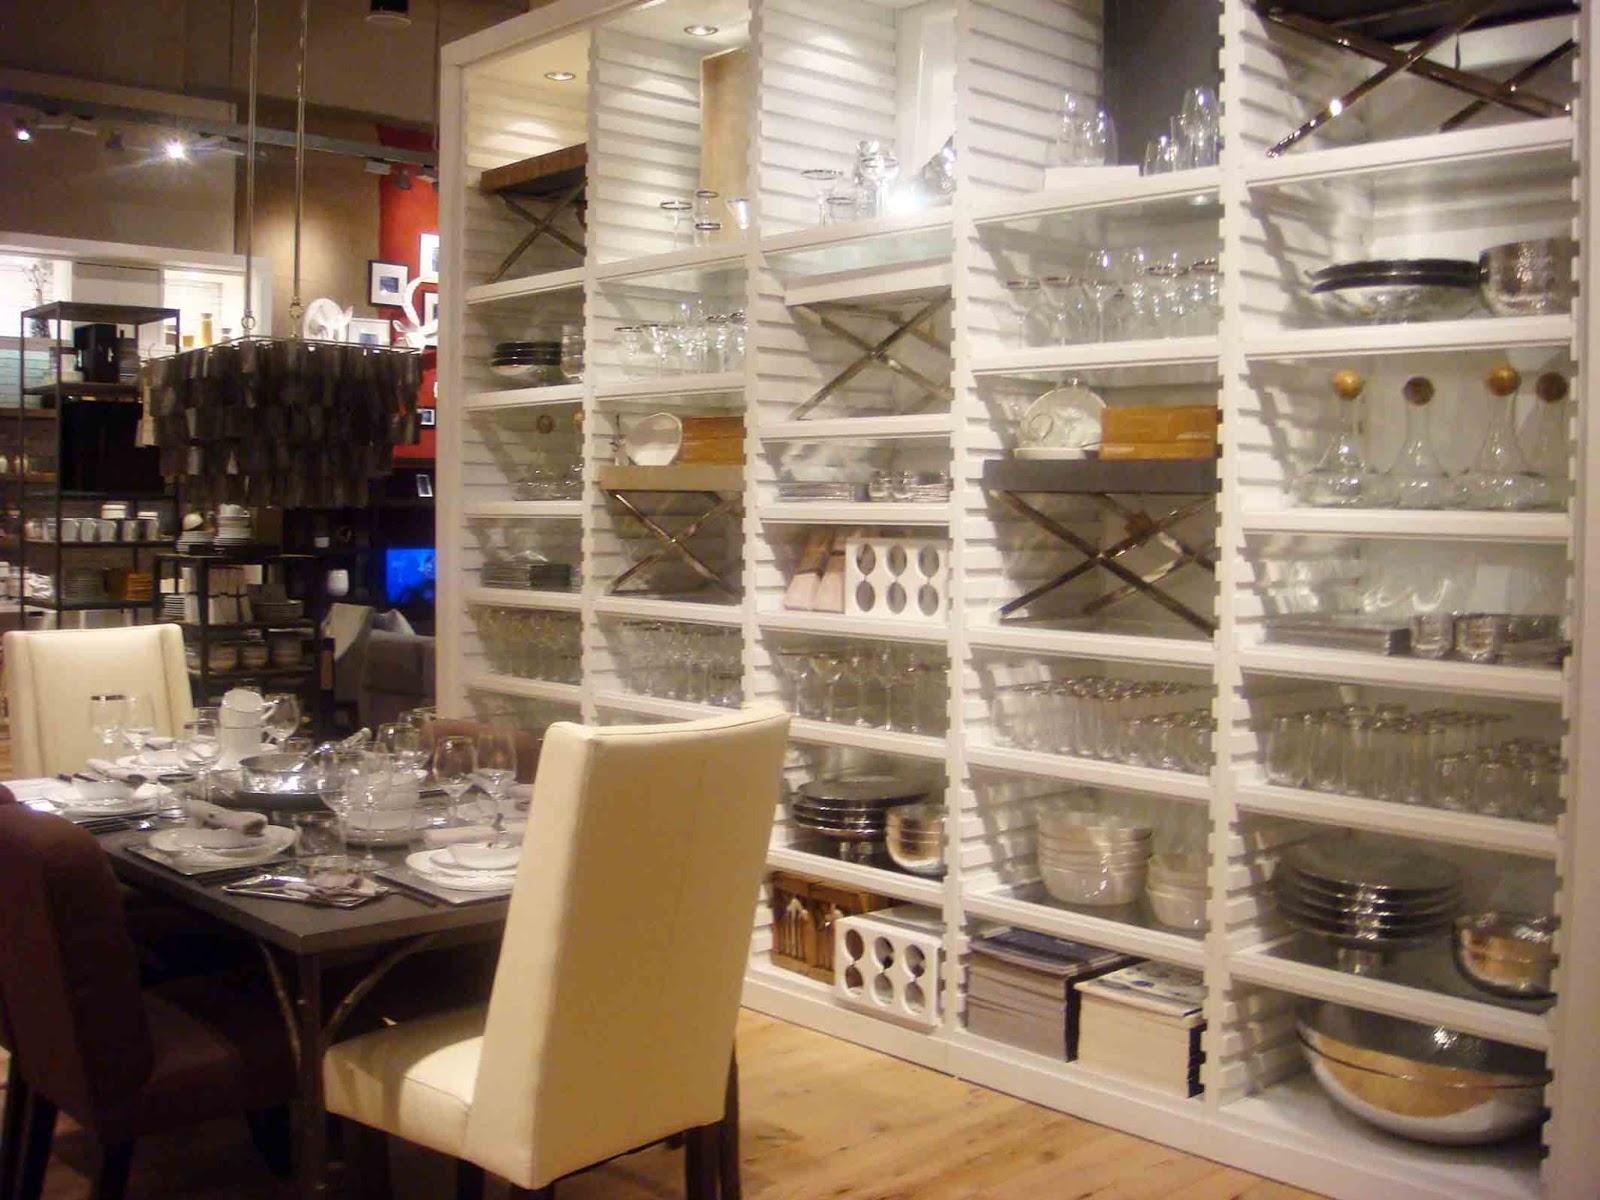 West elm in dubai design gourmande for West elm like stores